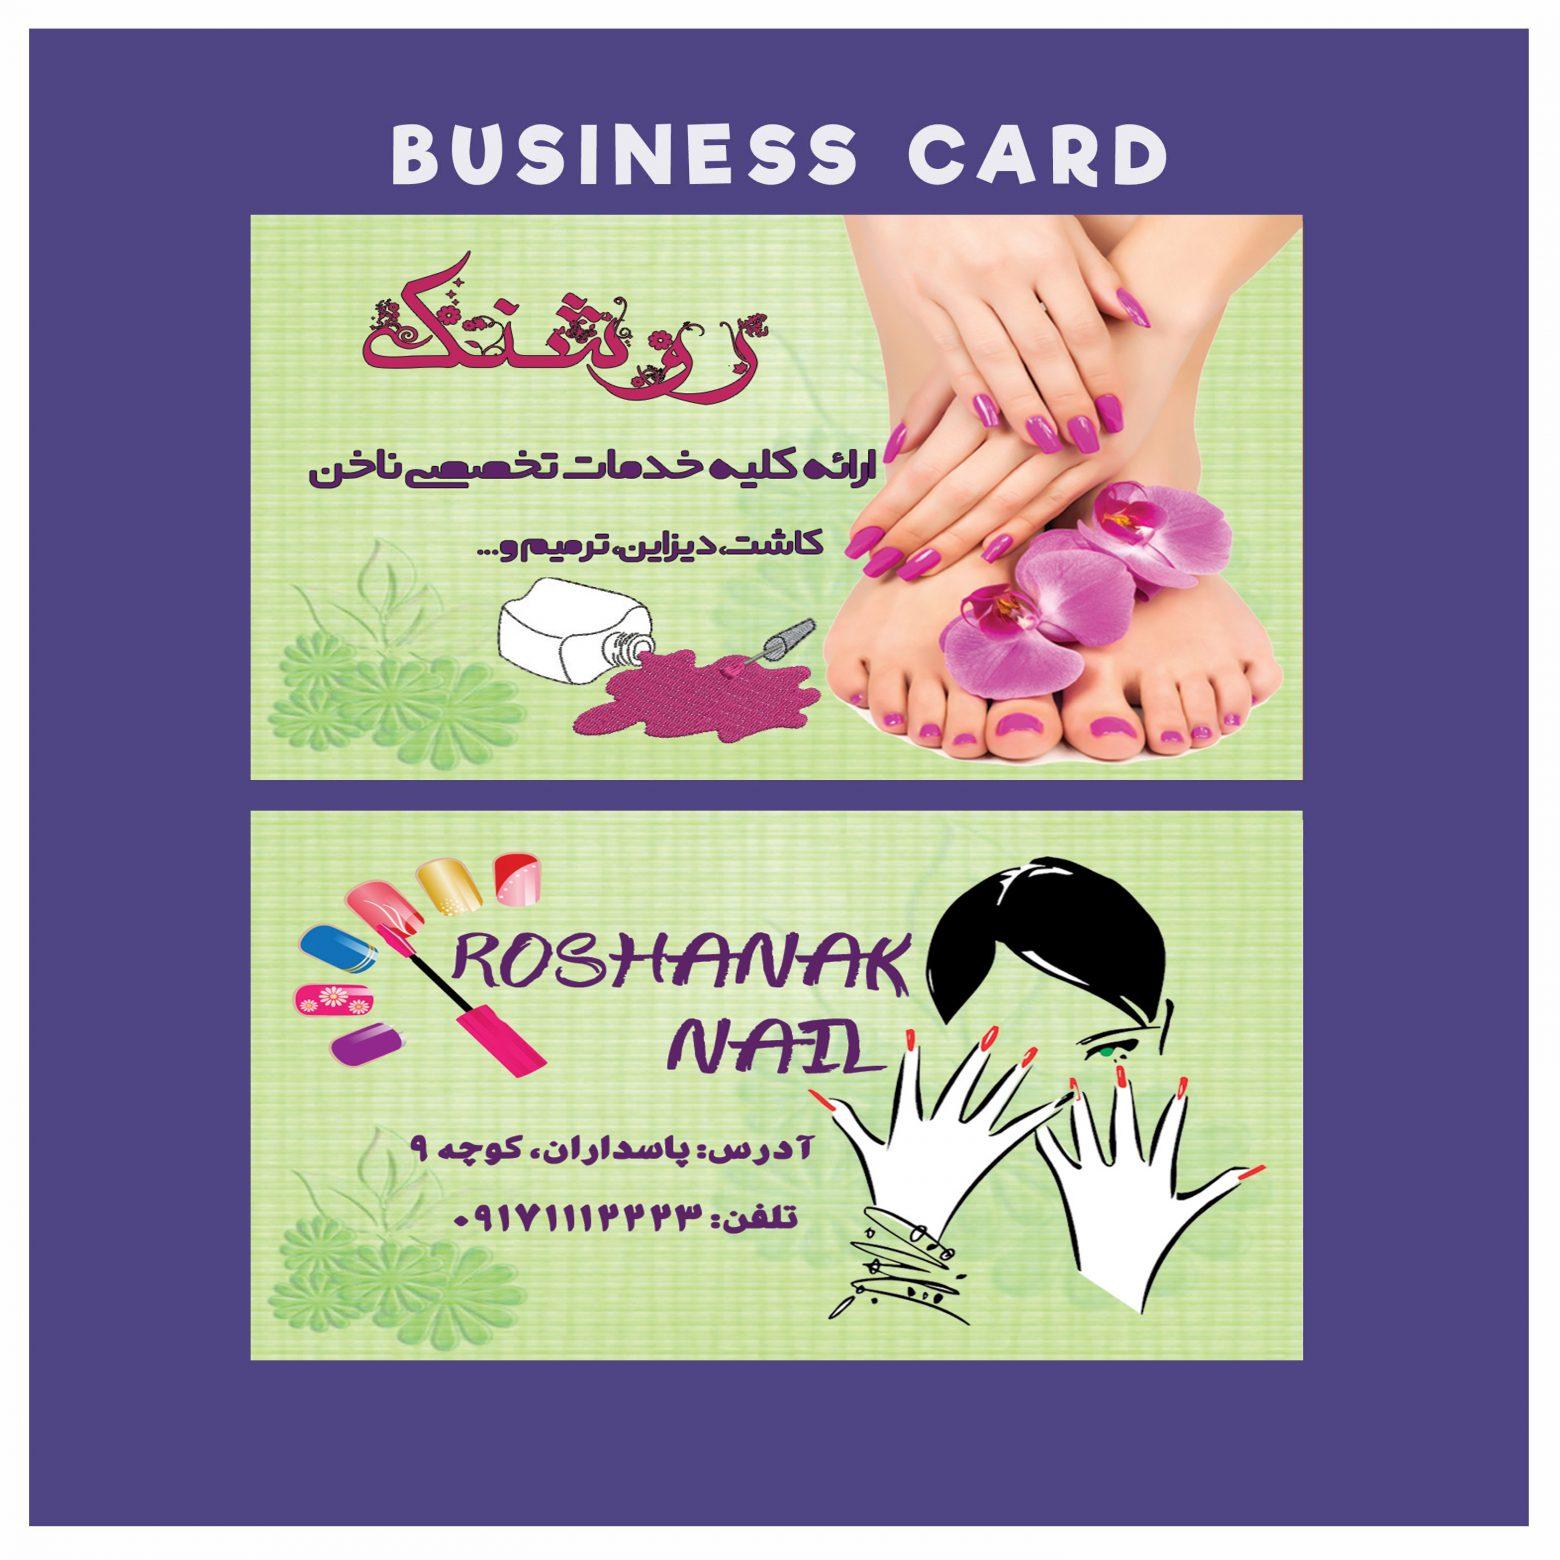 3480646 1560x1560 - کارت ویزیت خدمات کاشت ناخن